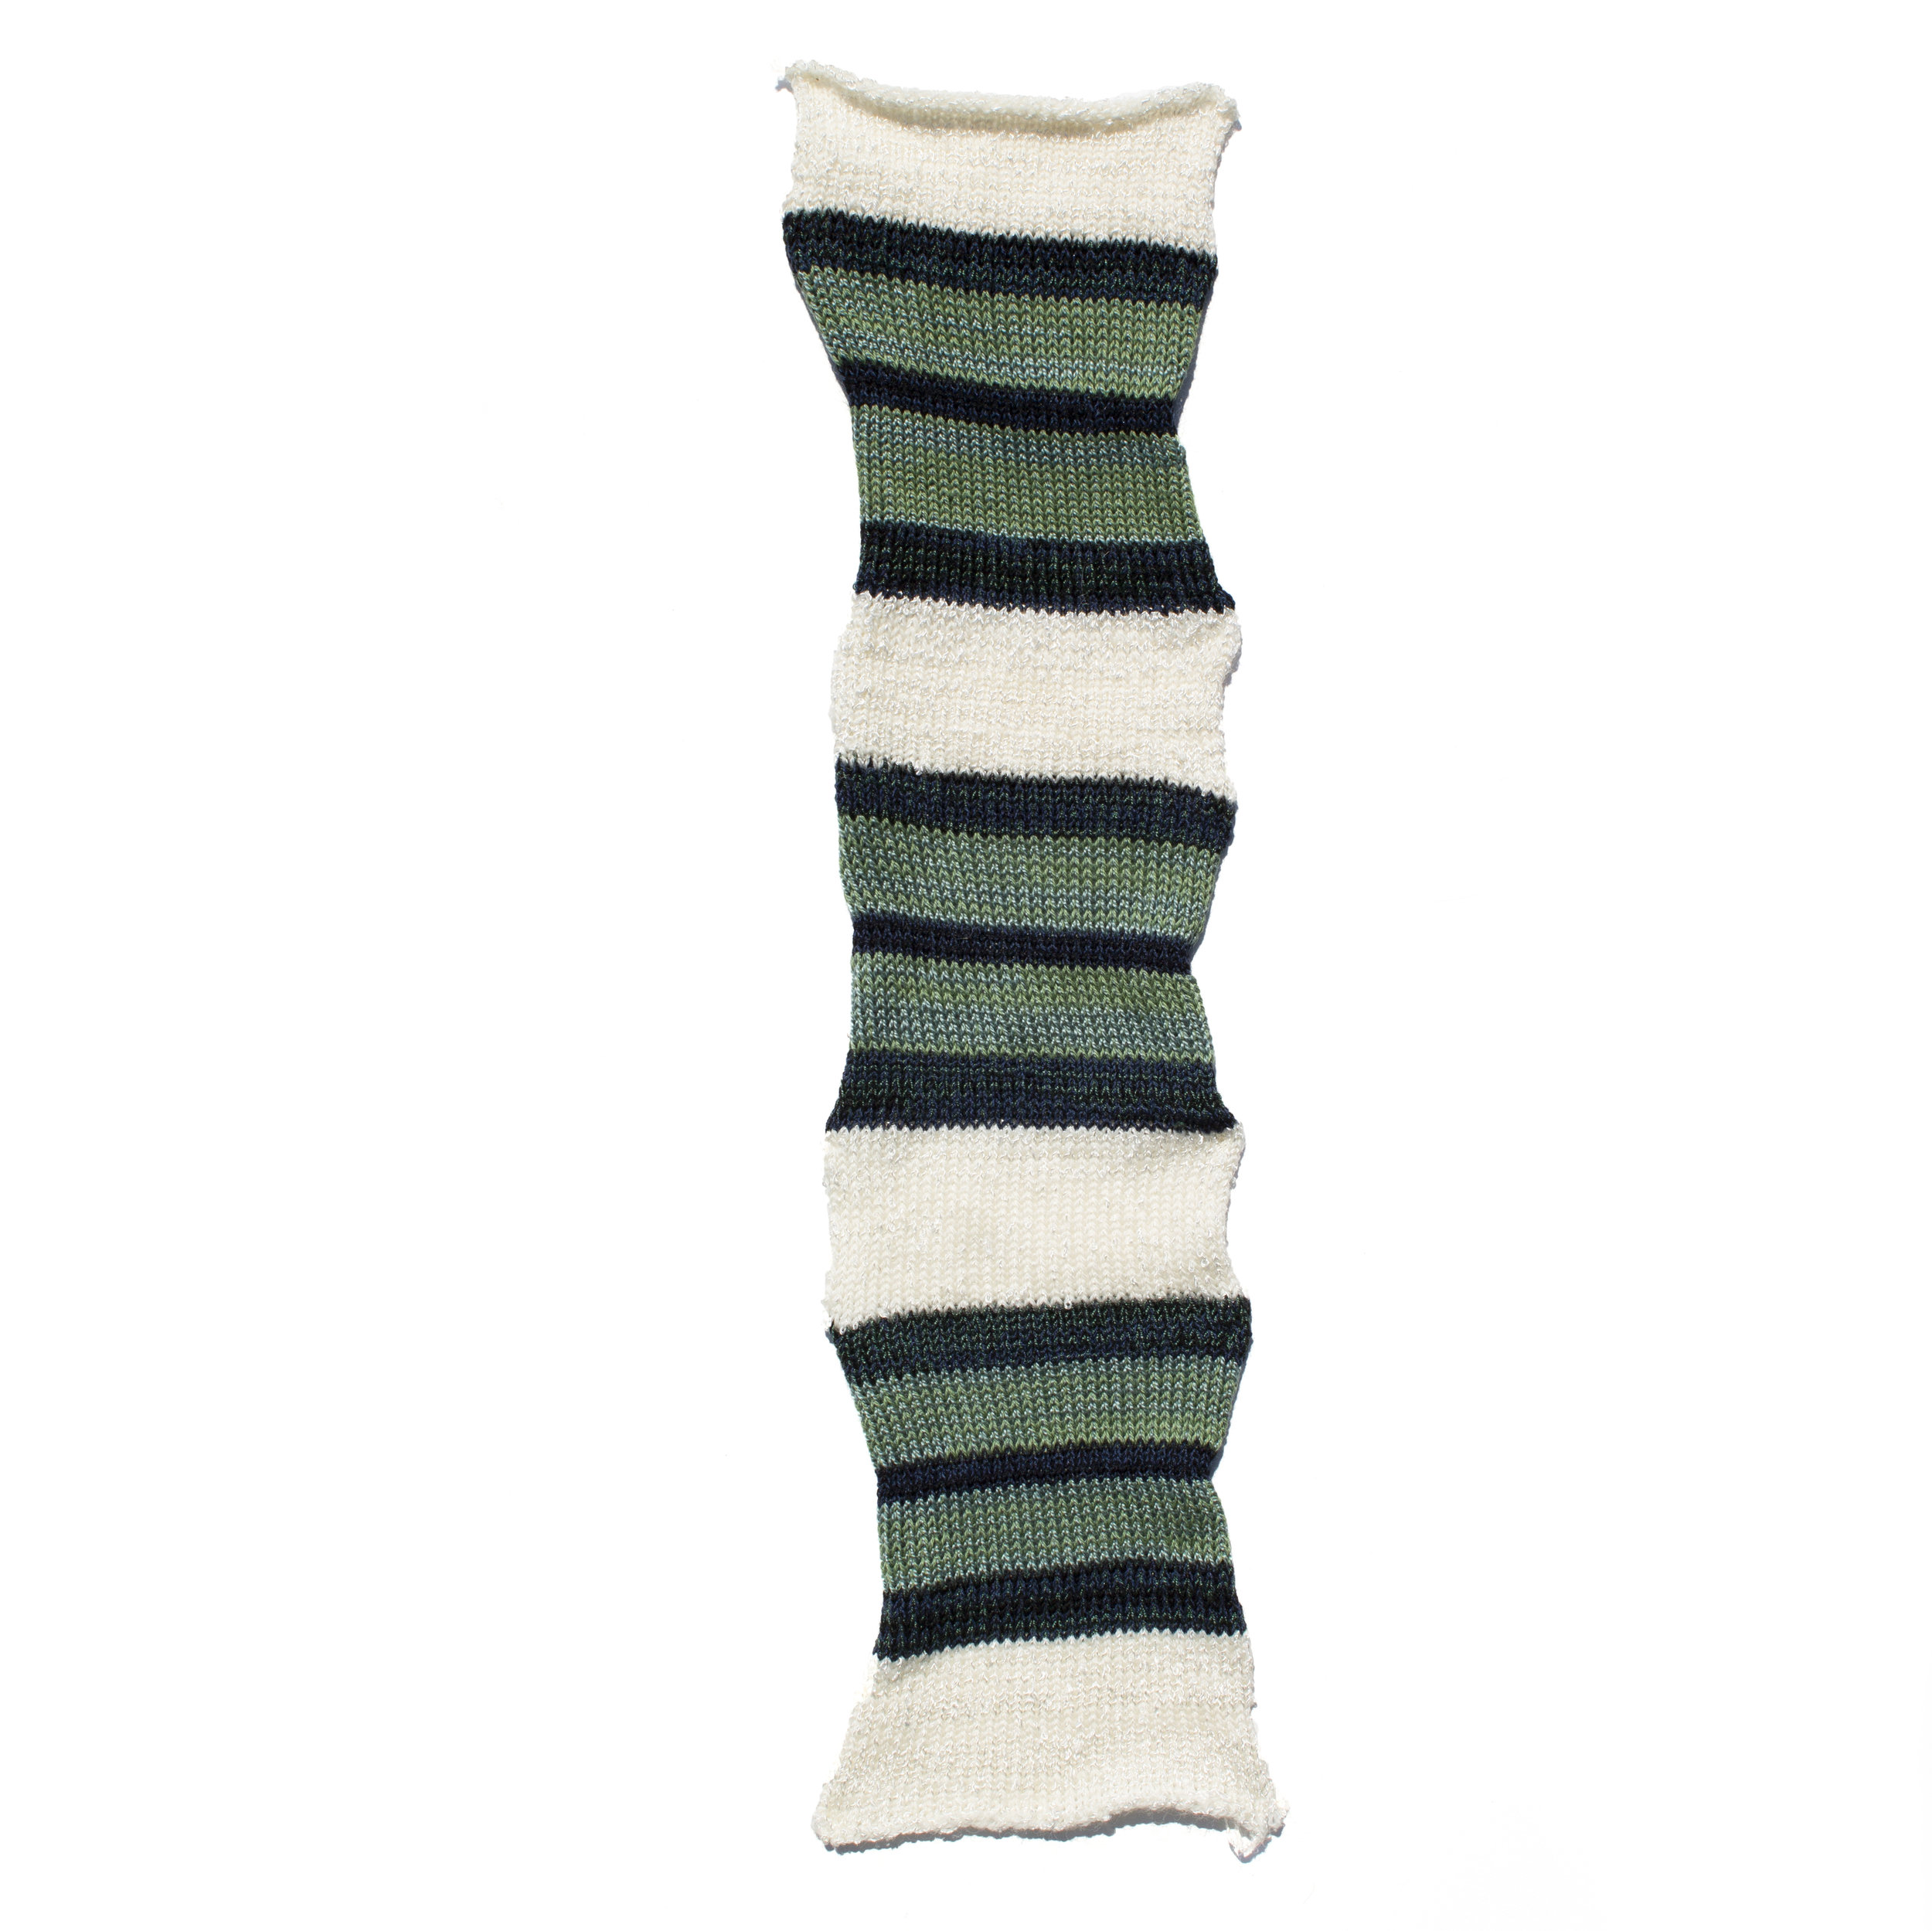 knit19.jpg